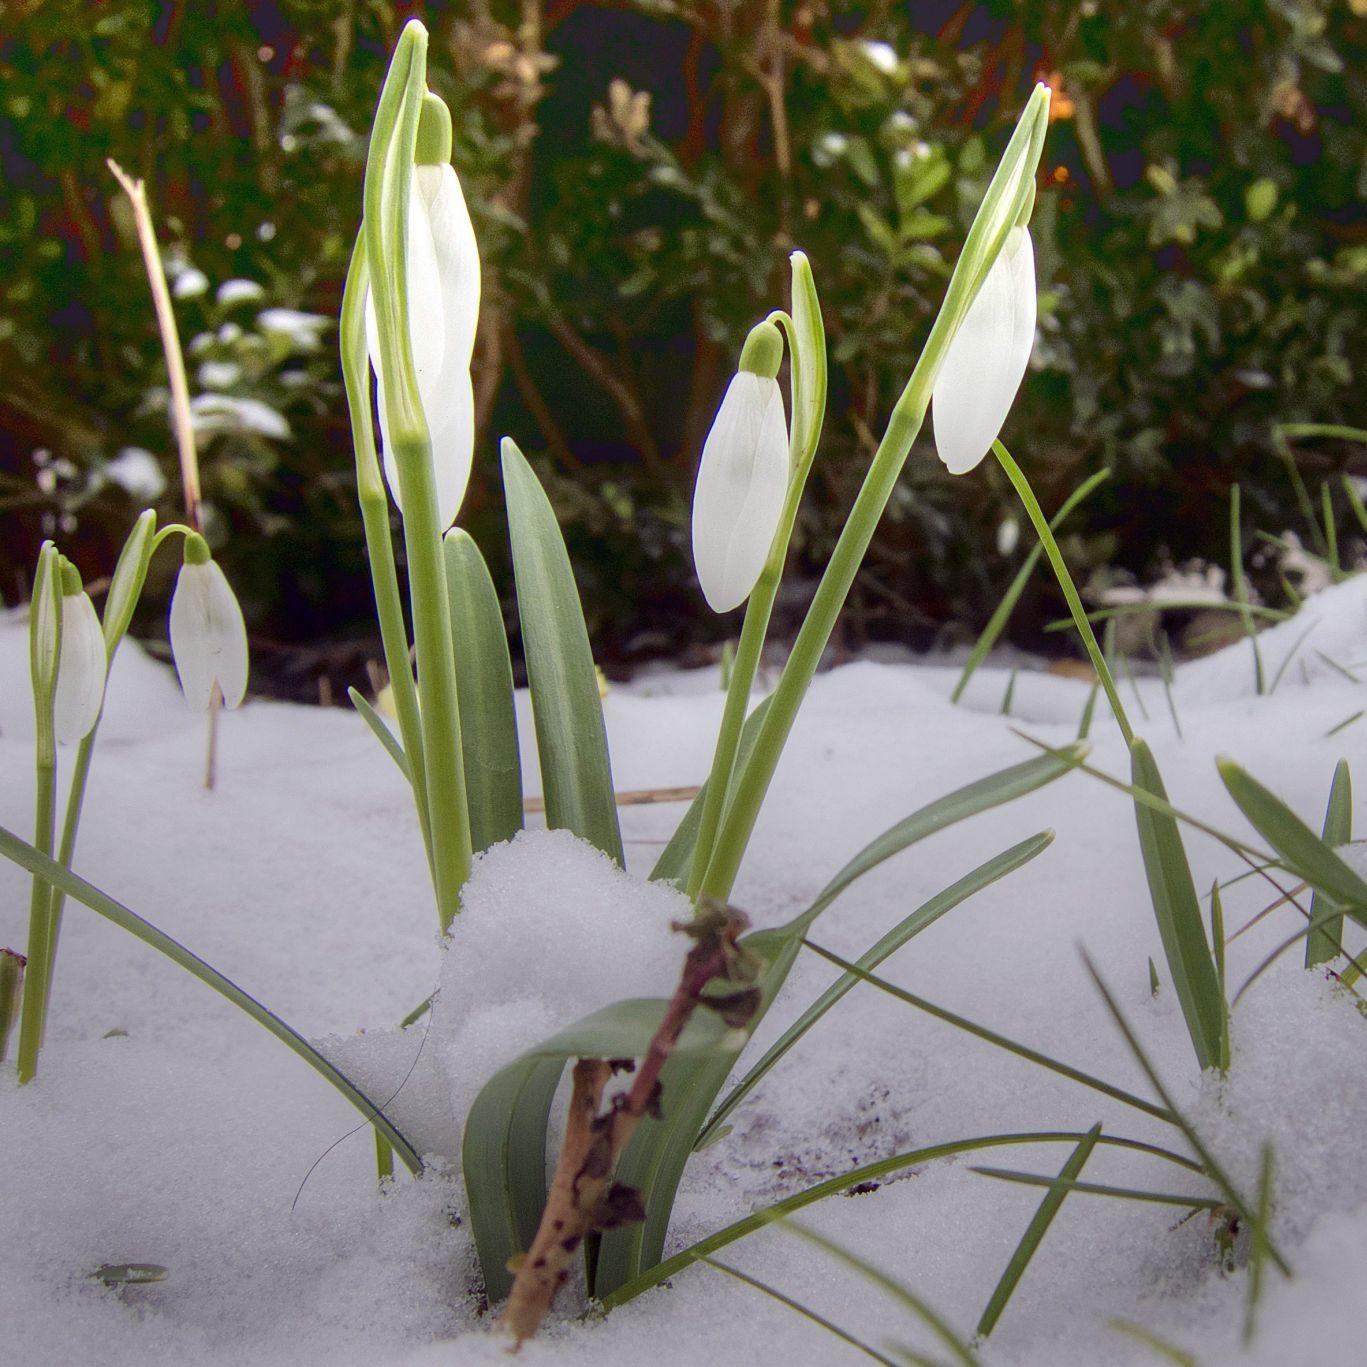 Седмична прогноза: зимата губи инициативата